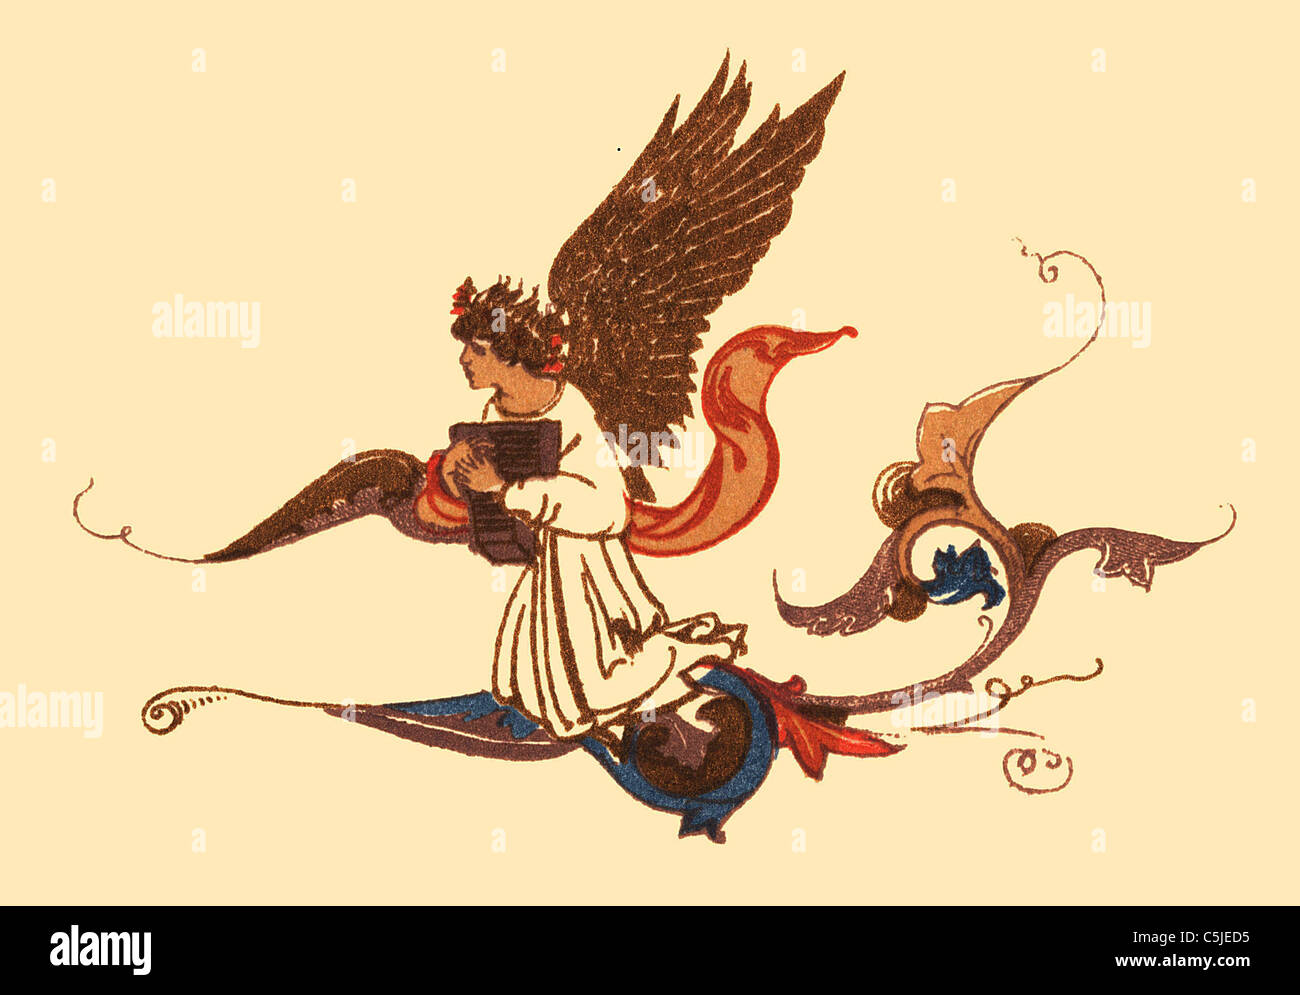 Antiquarian book illustration - Stock Image